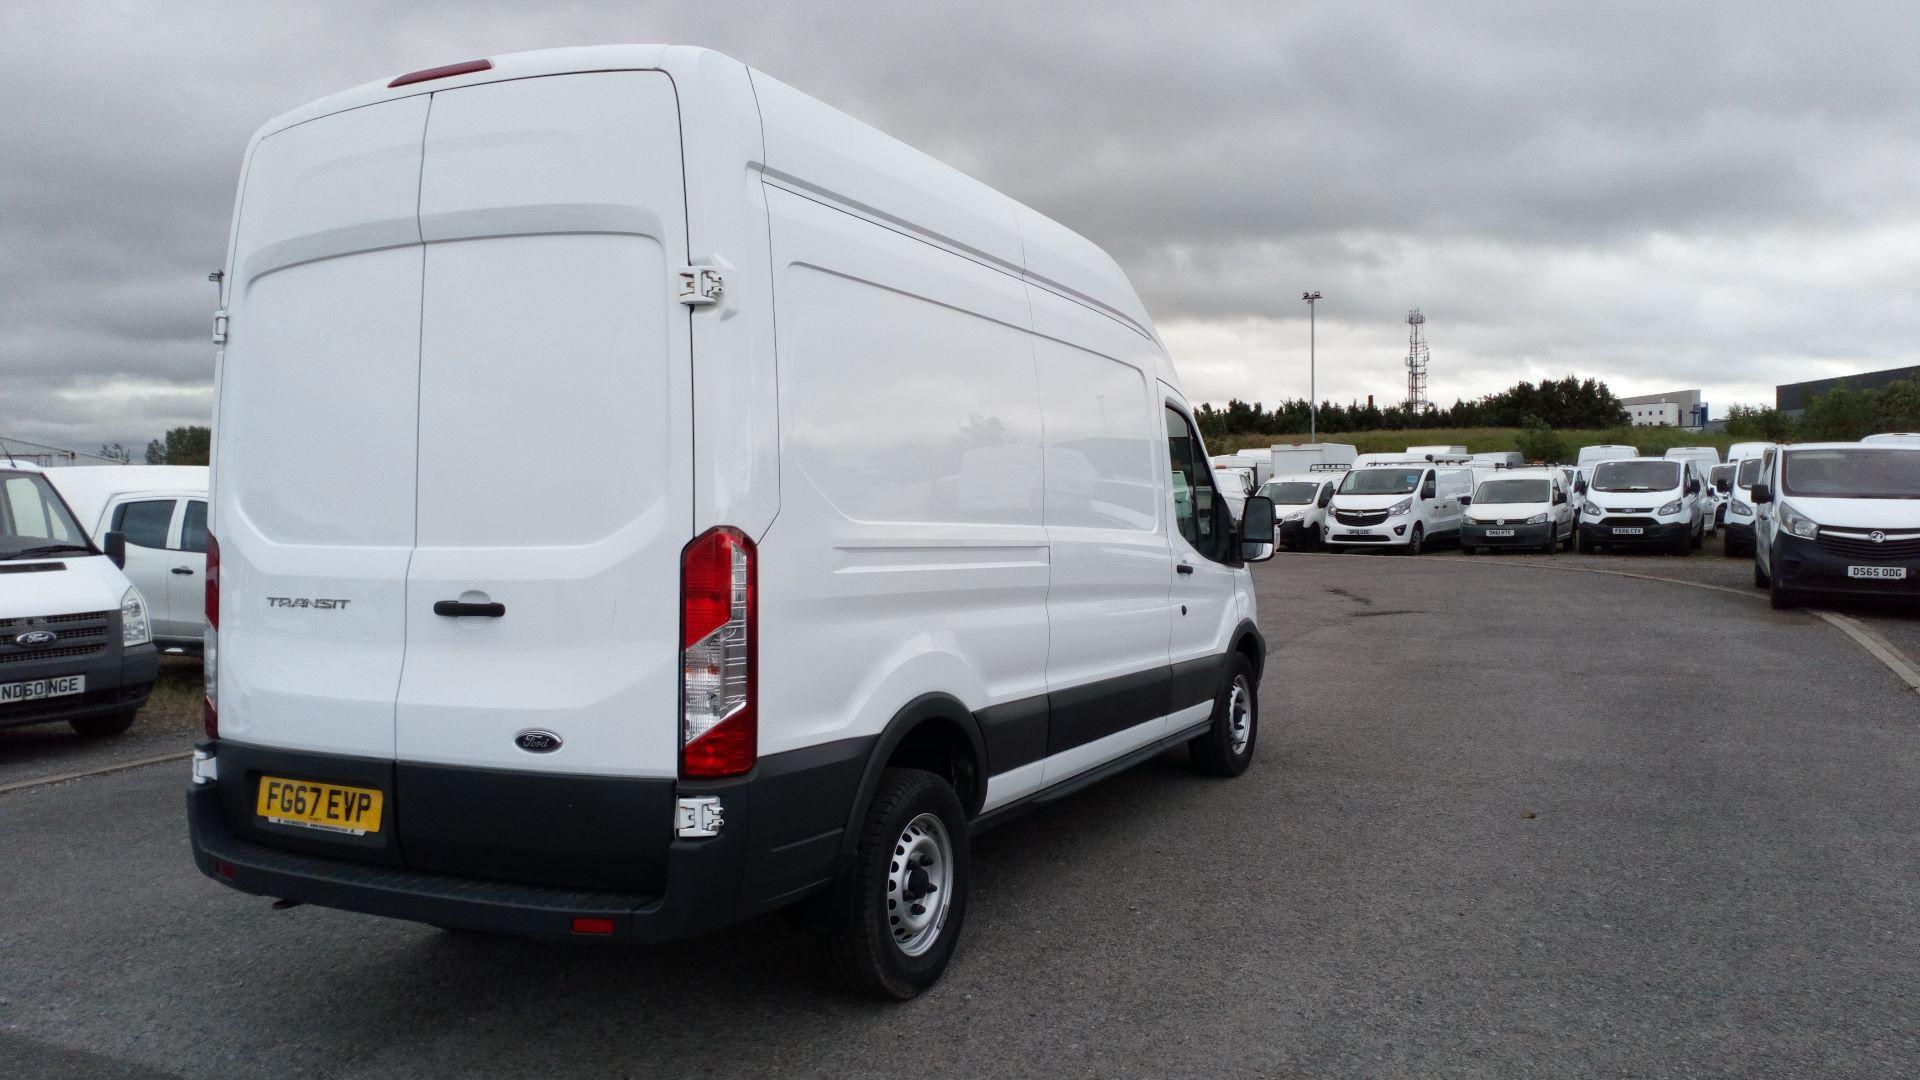 2017 Ford Transit 2.0 Tdci 130Ps H3 Van (FG67EVP) Image 4